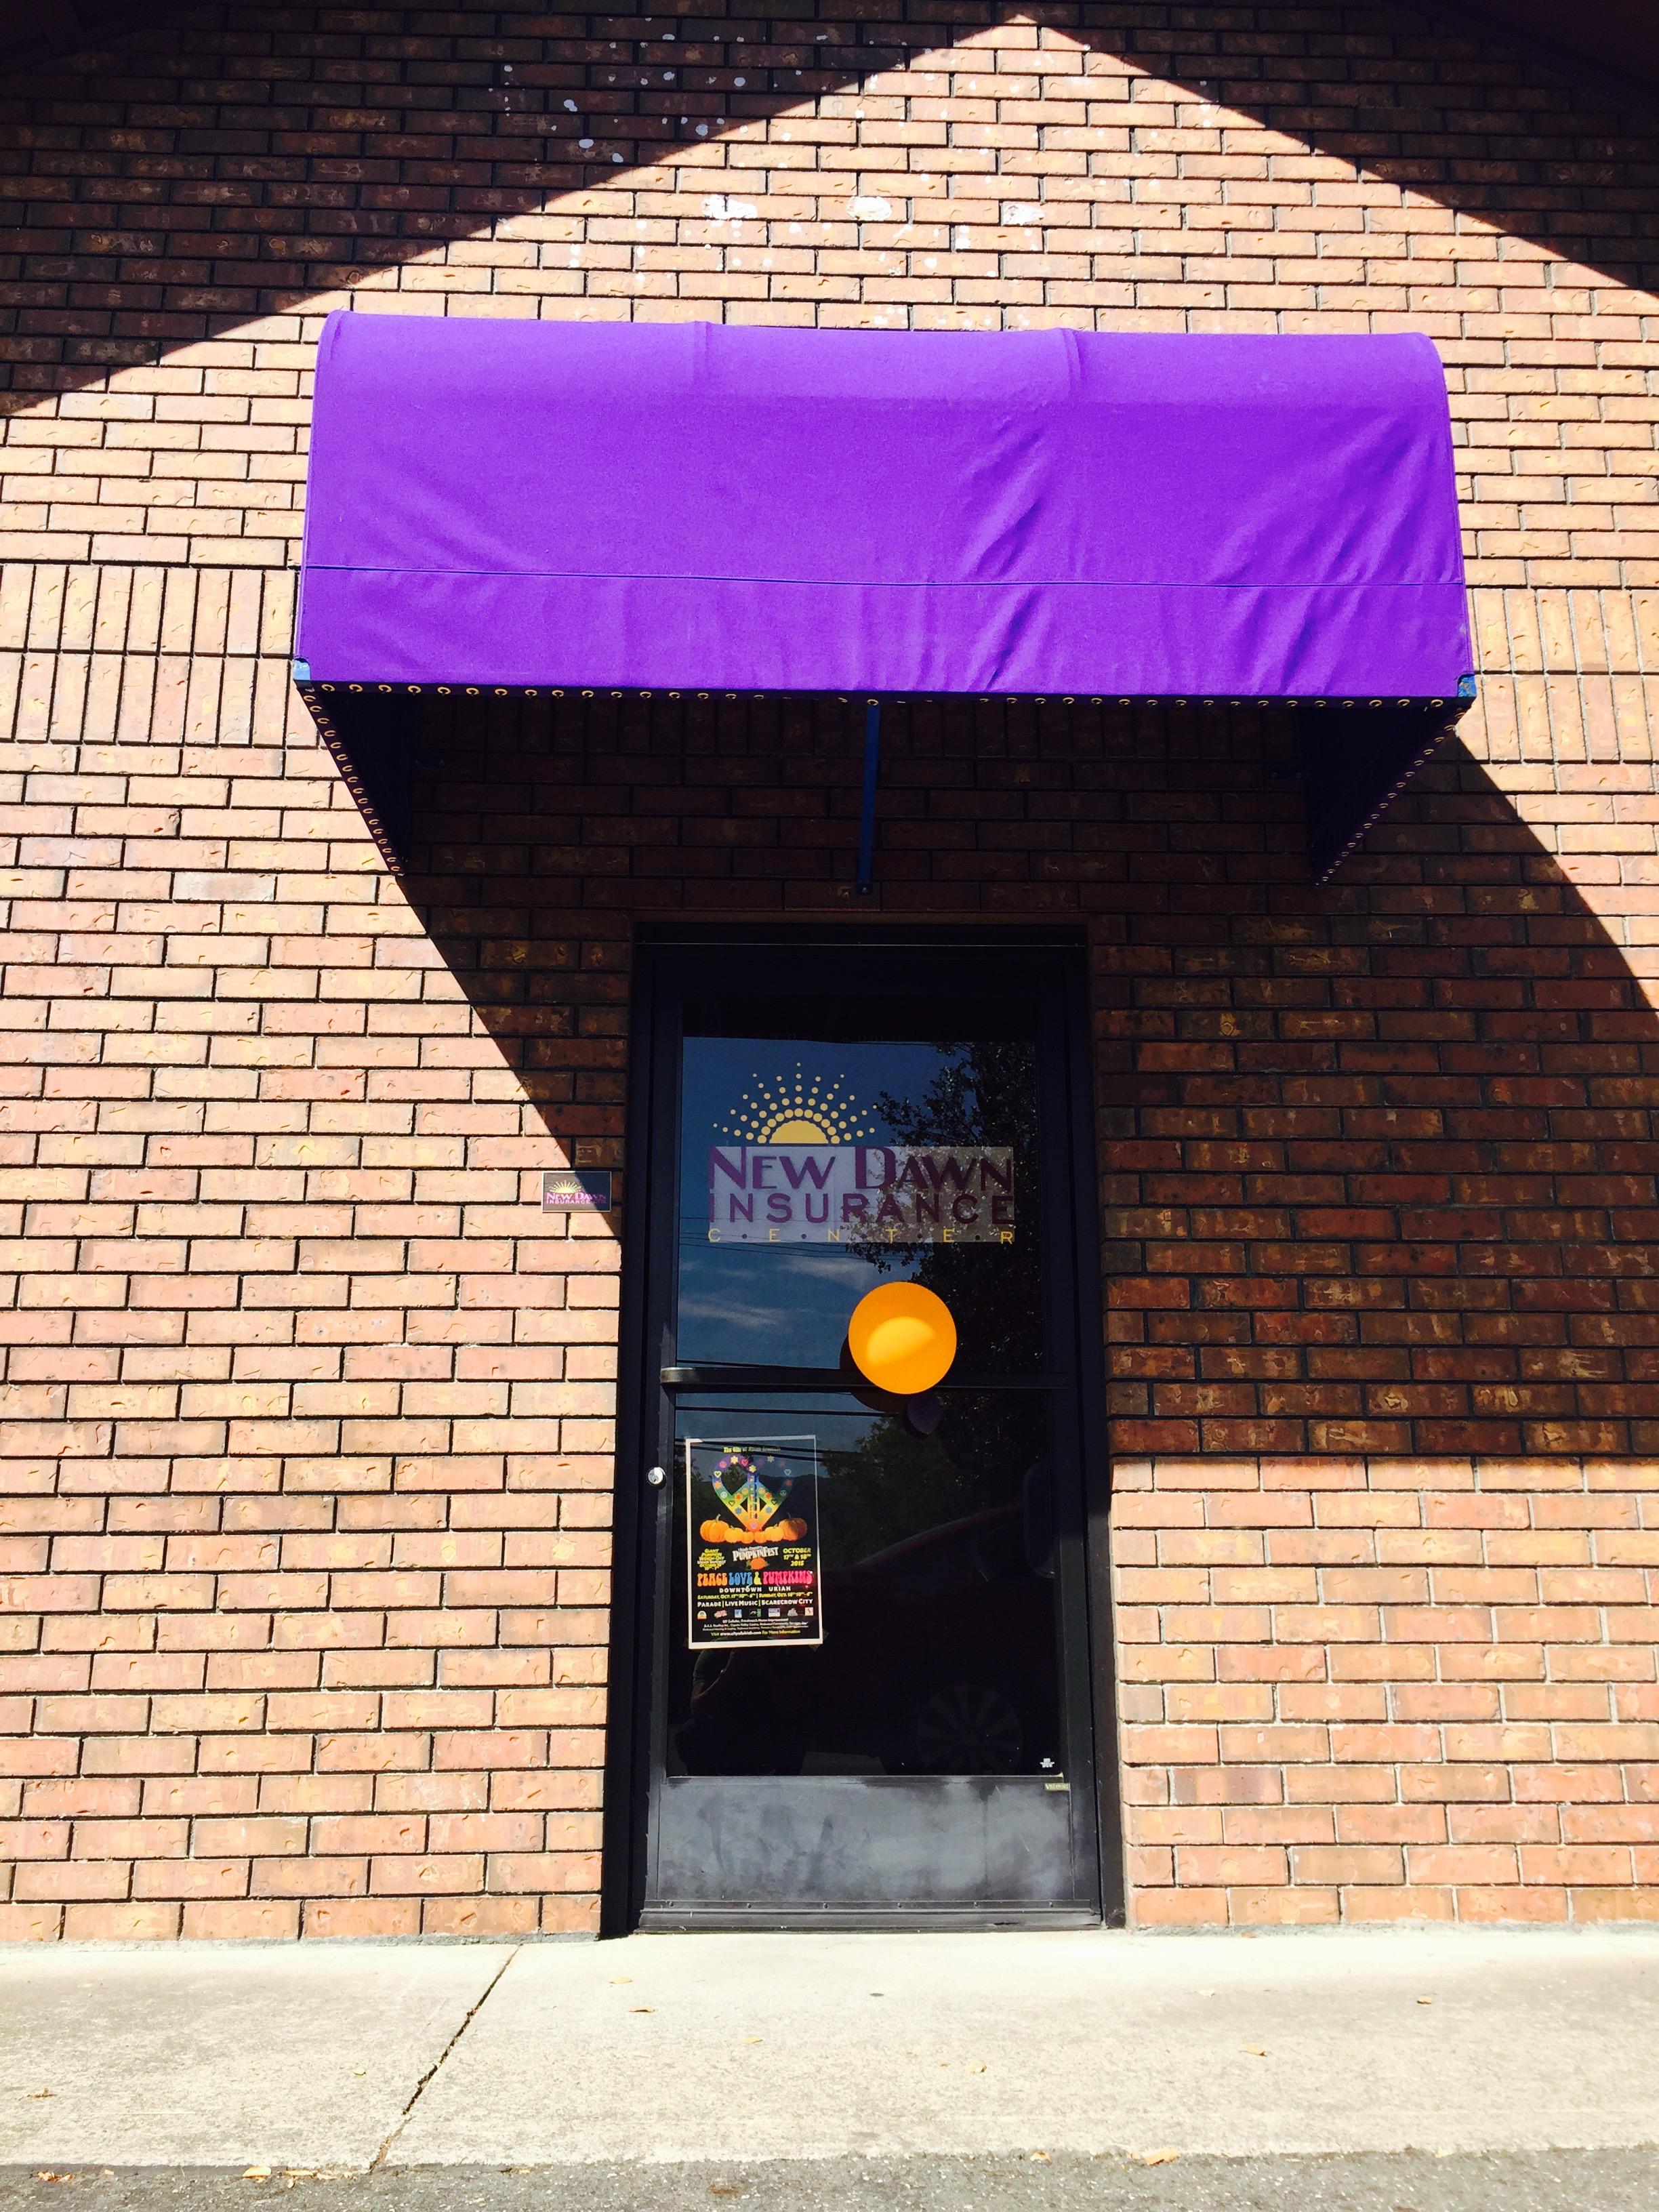 New Dawn Insurance Center | 1040 N State St Ste A, Ukiah, CA, 95482 | +1 (707) 456-4264